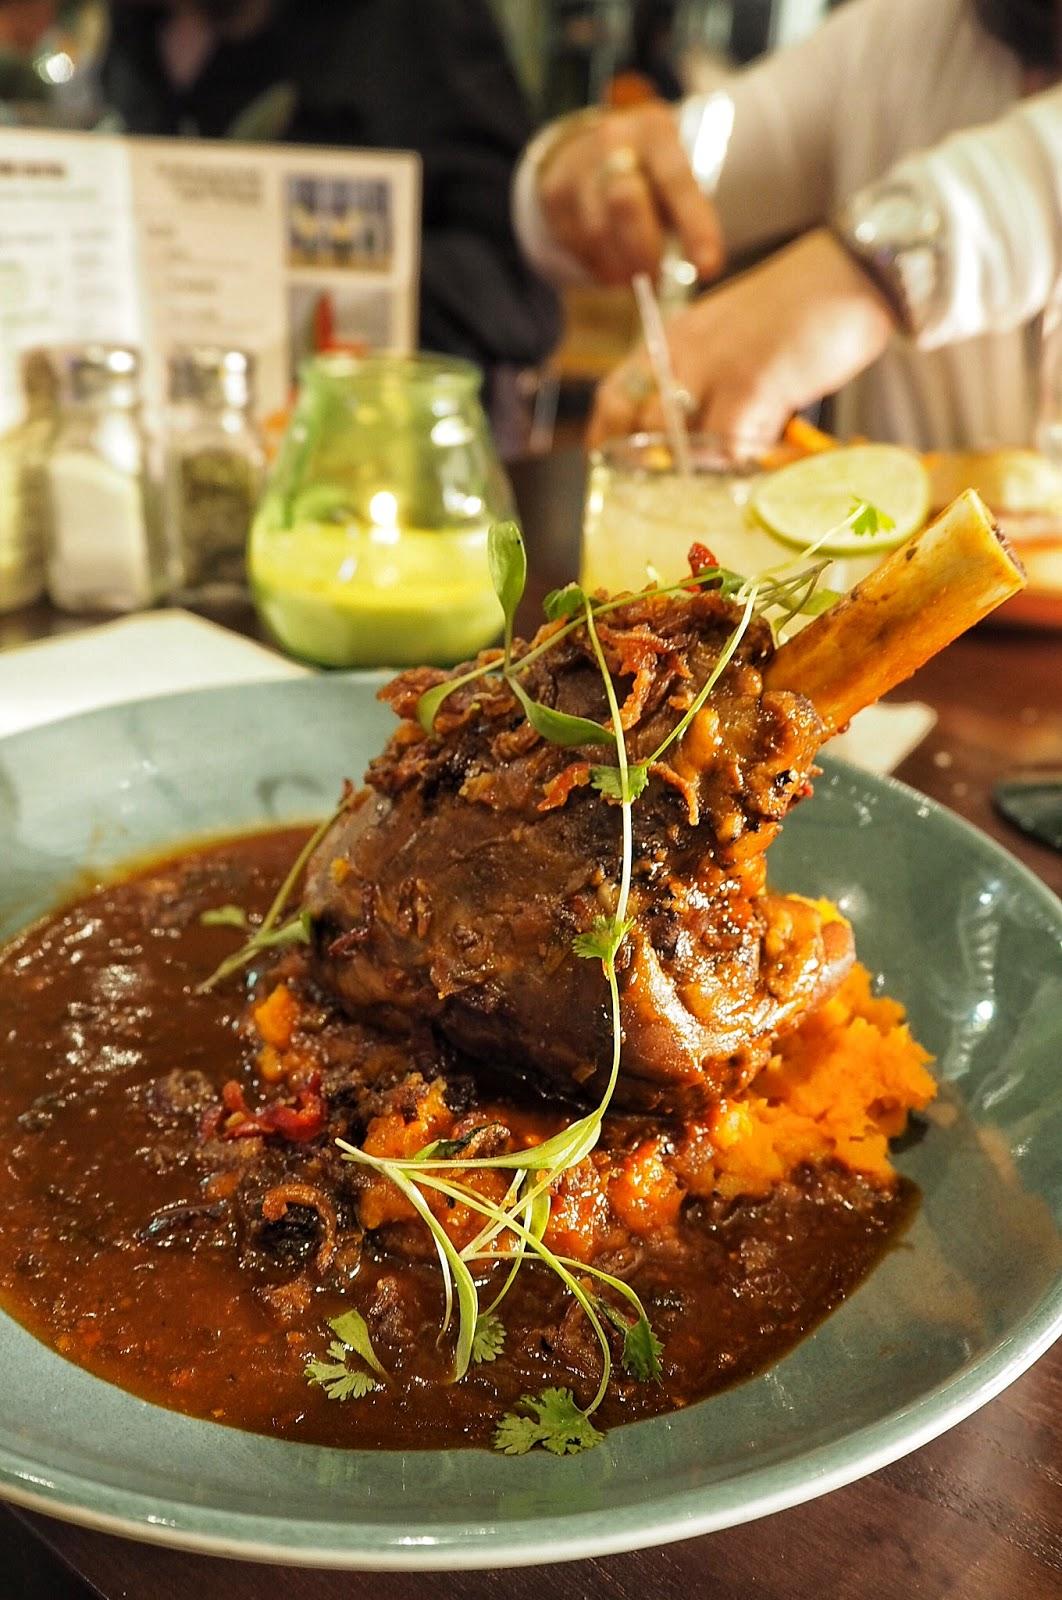 Las Iguanas, Milton Keynes, MK, LoveMK, South American, Food, Restaurant, cocktails, The Hub, www.thelifeofasocialbutterfly.co.uk, Jaz, MK Blogger, Lifestyle Blogger, Foodie, Lamb Shank, Peruvian